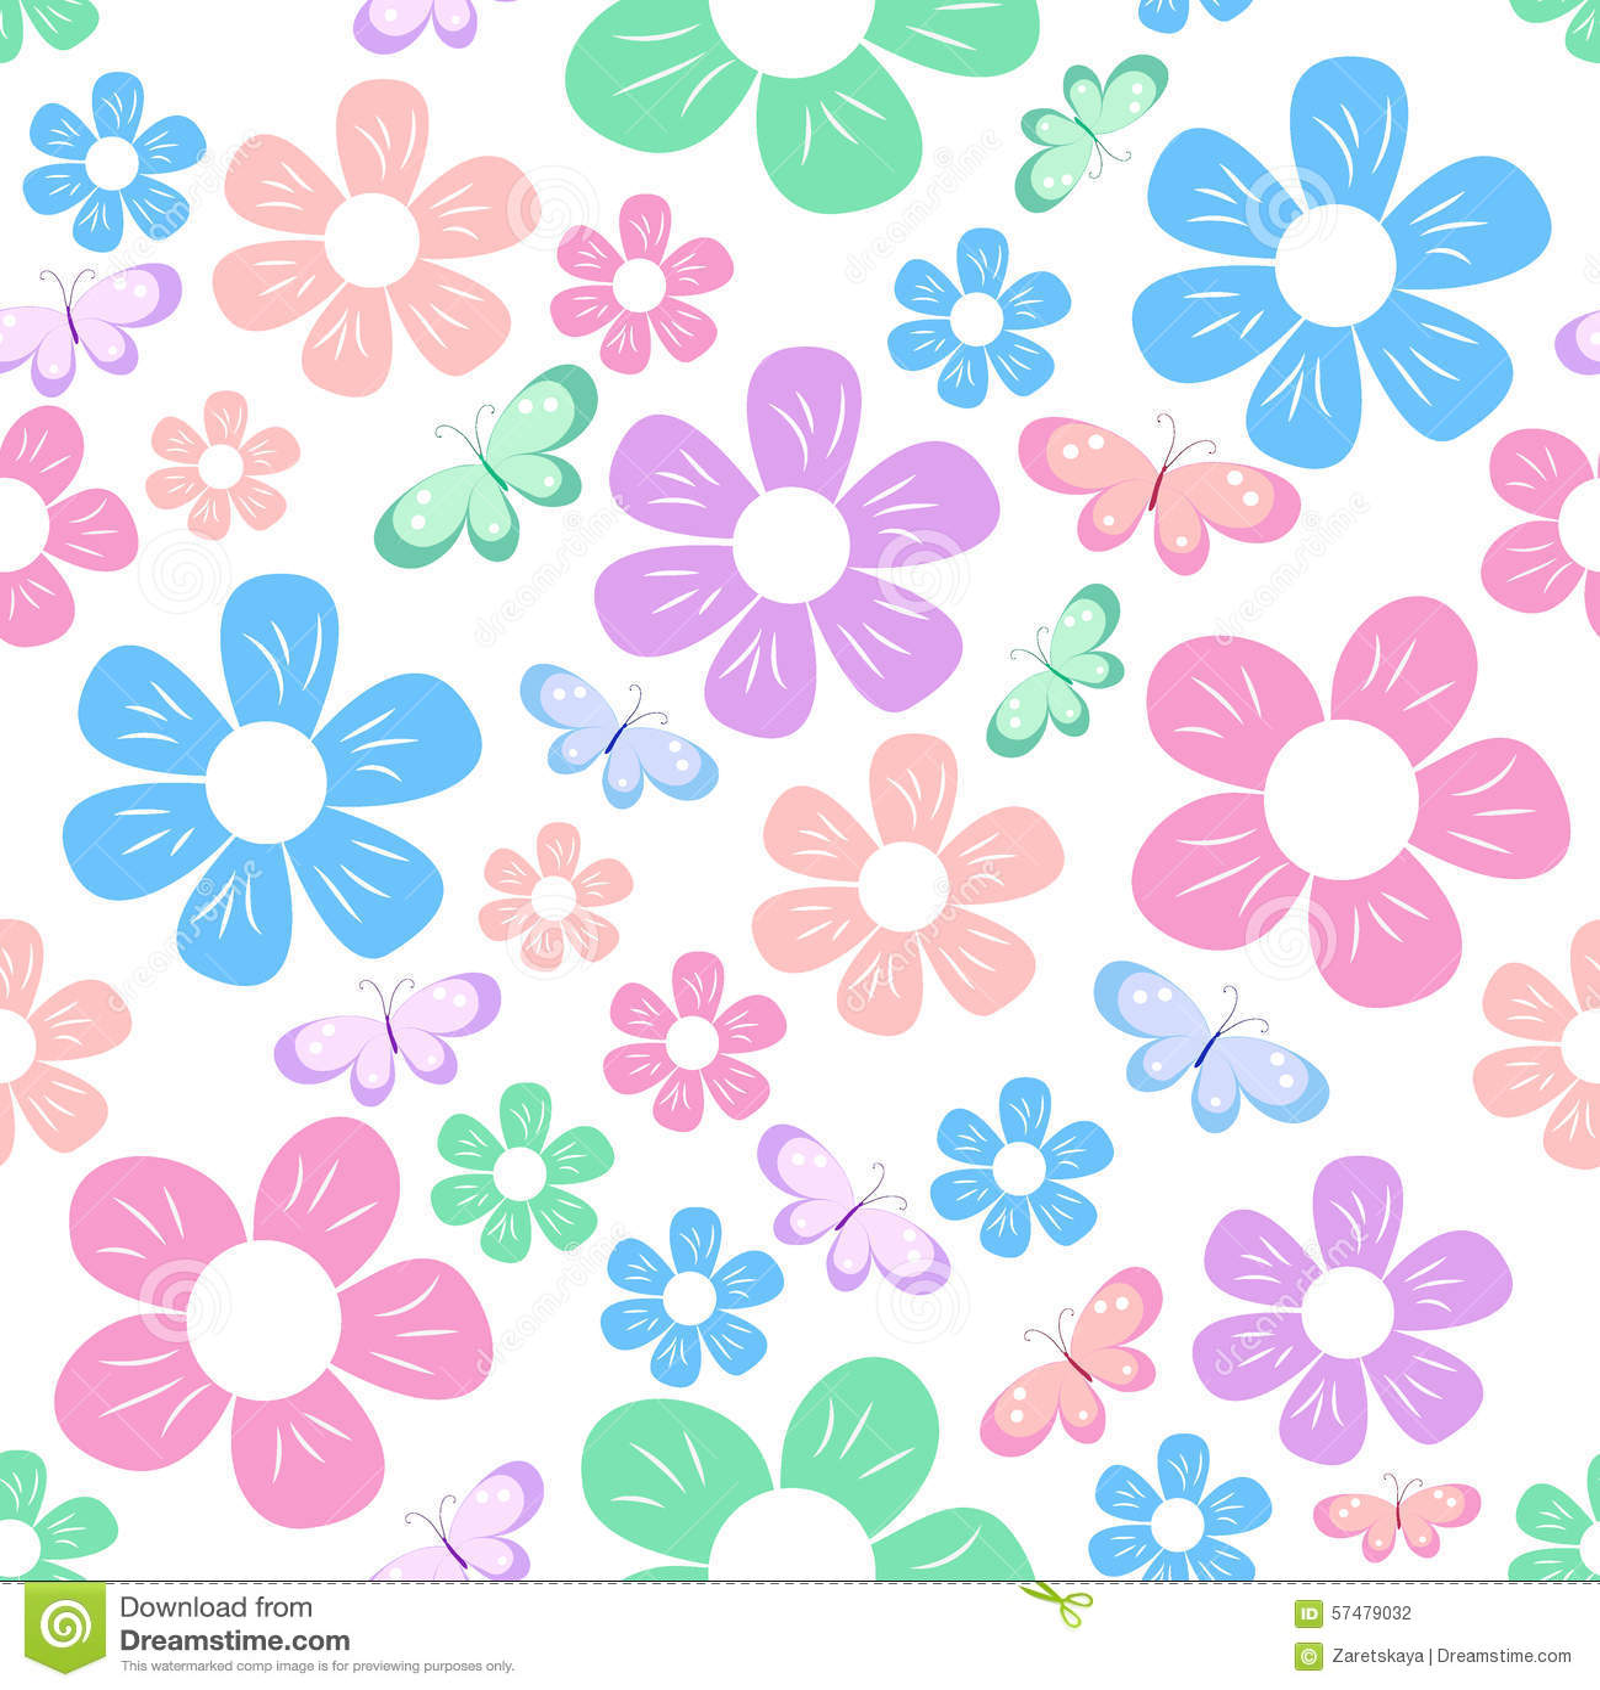 Simple flowers pattern